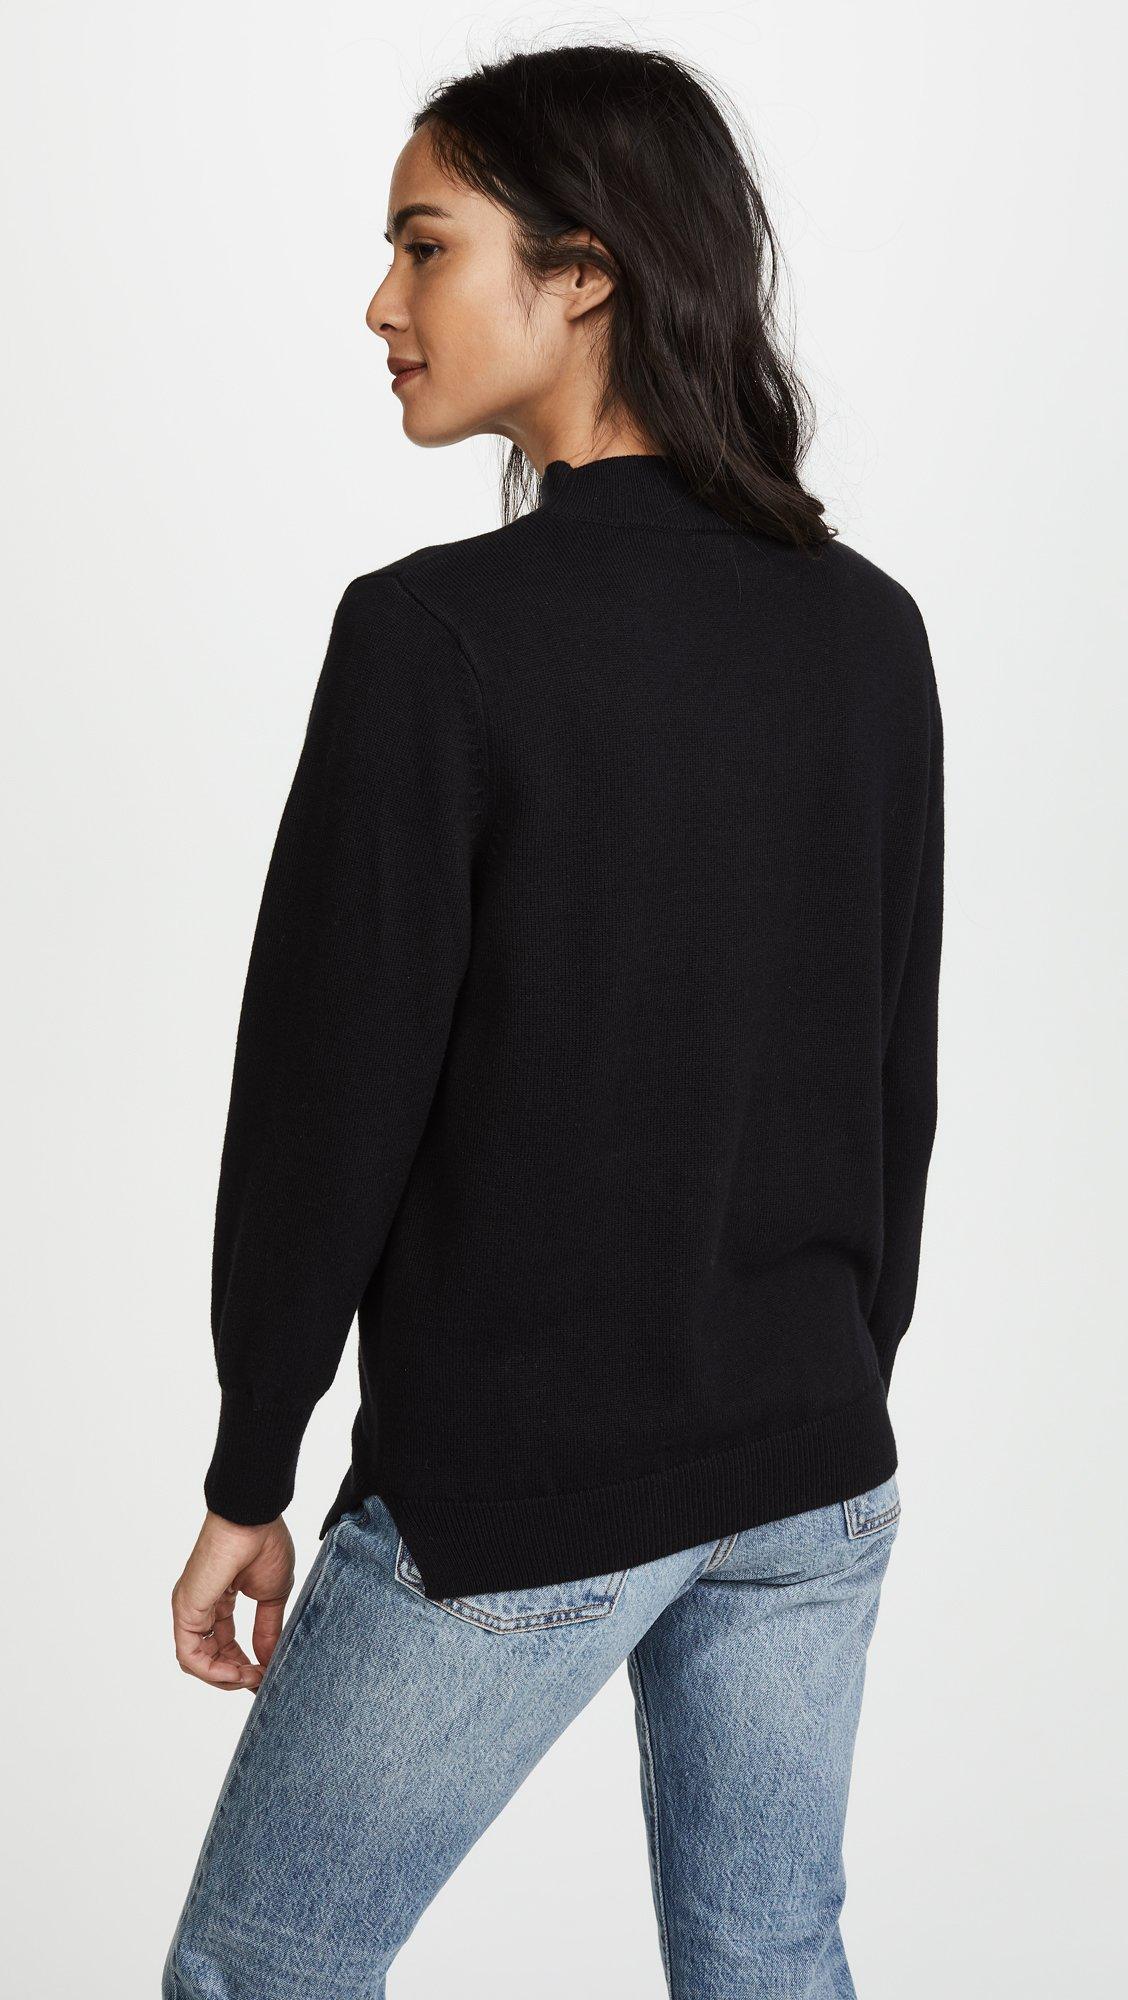 LNA Women's Joey Detached Sweater, Black, Small by LNA (Image #3)